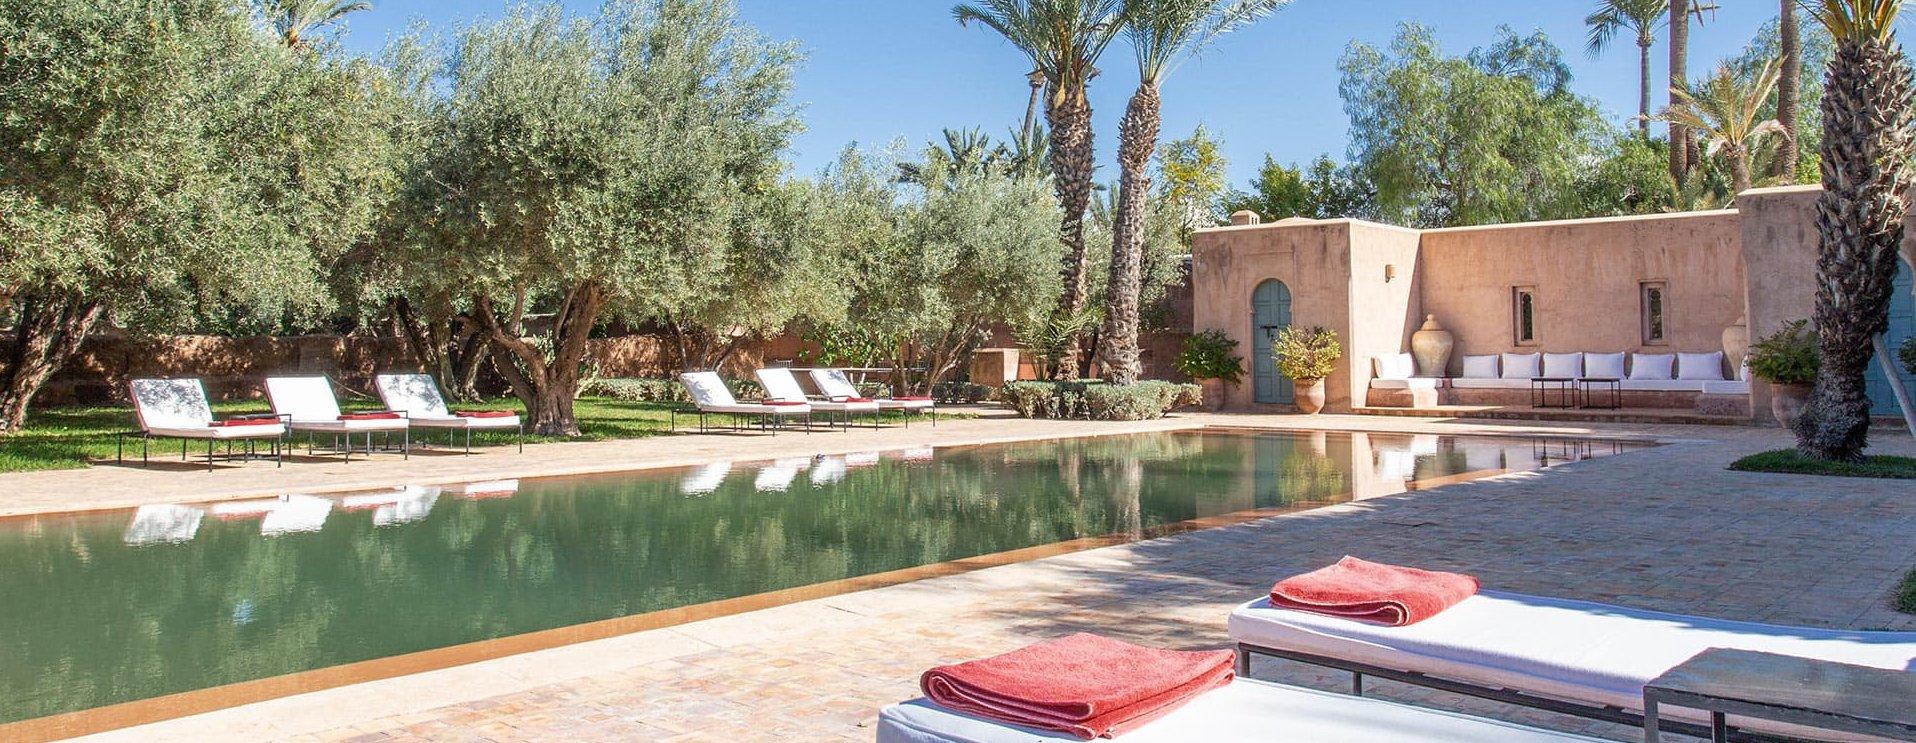 luxury-11-bedroom-villa-marrakech